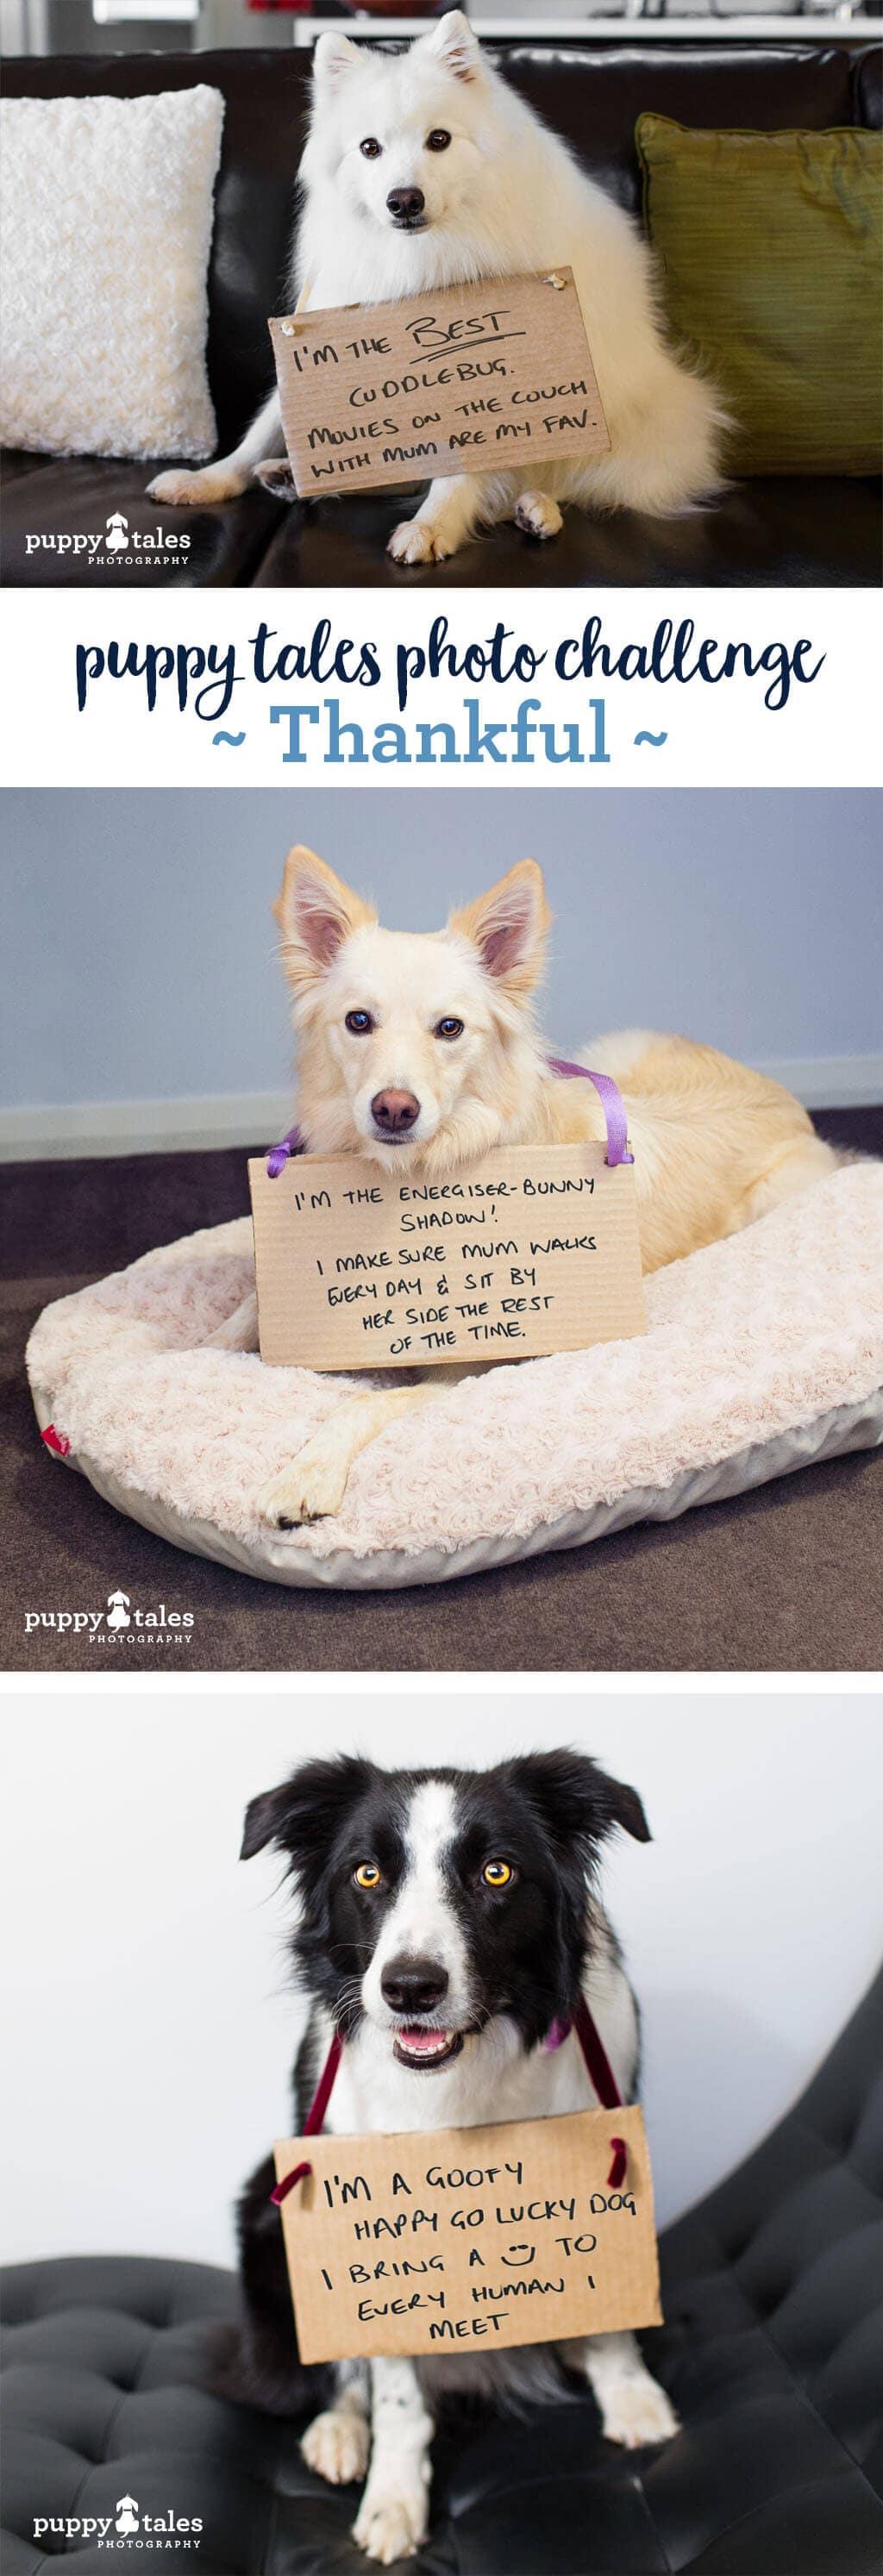 Puppy Tales Photo Challenge ~ Thankful